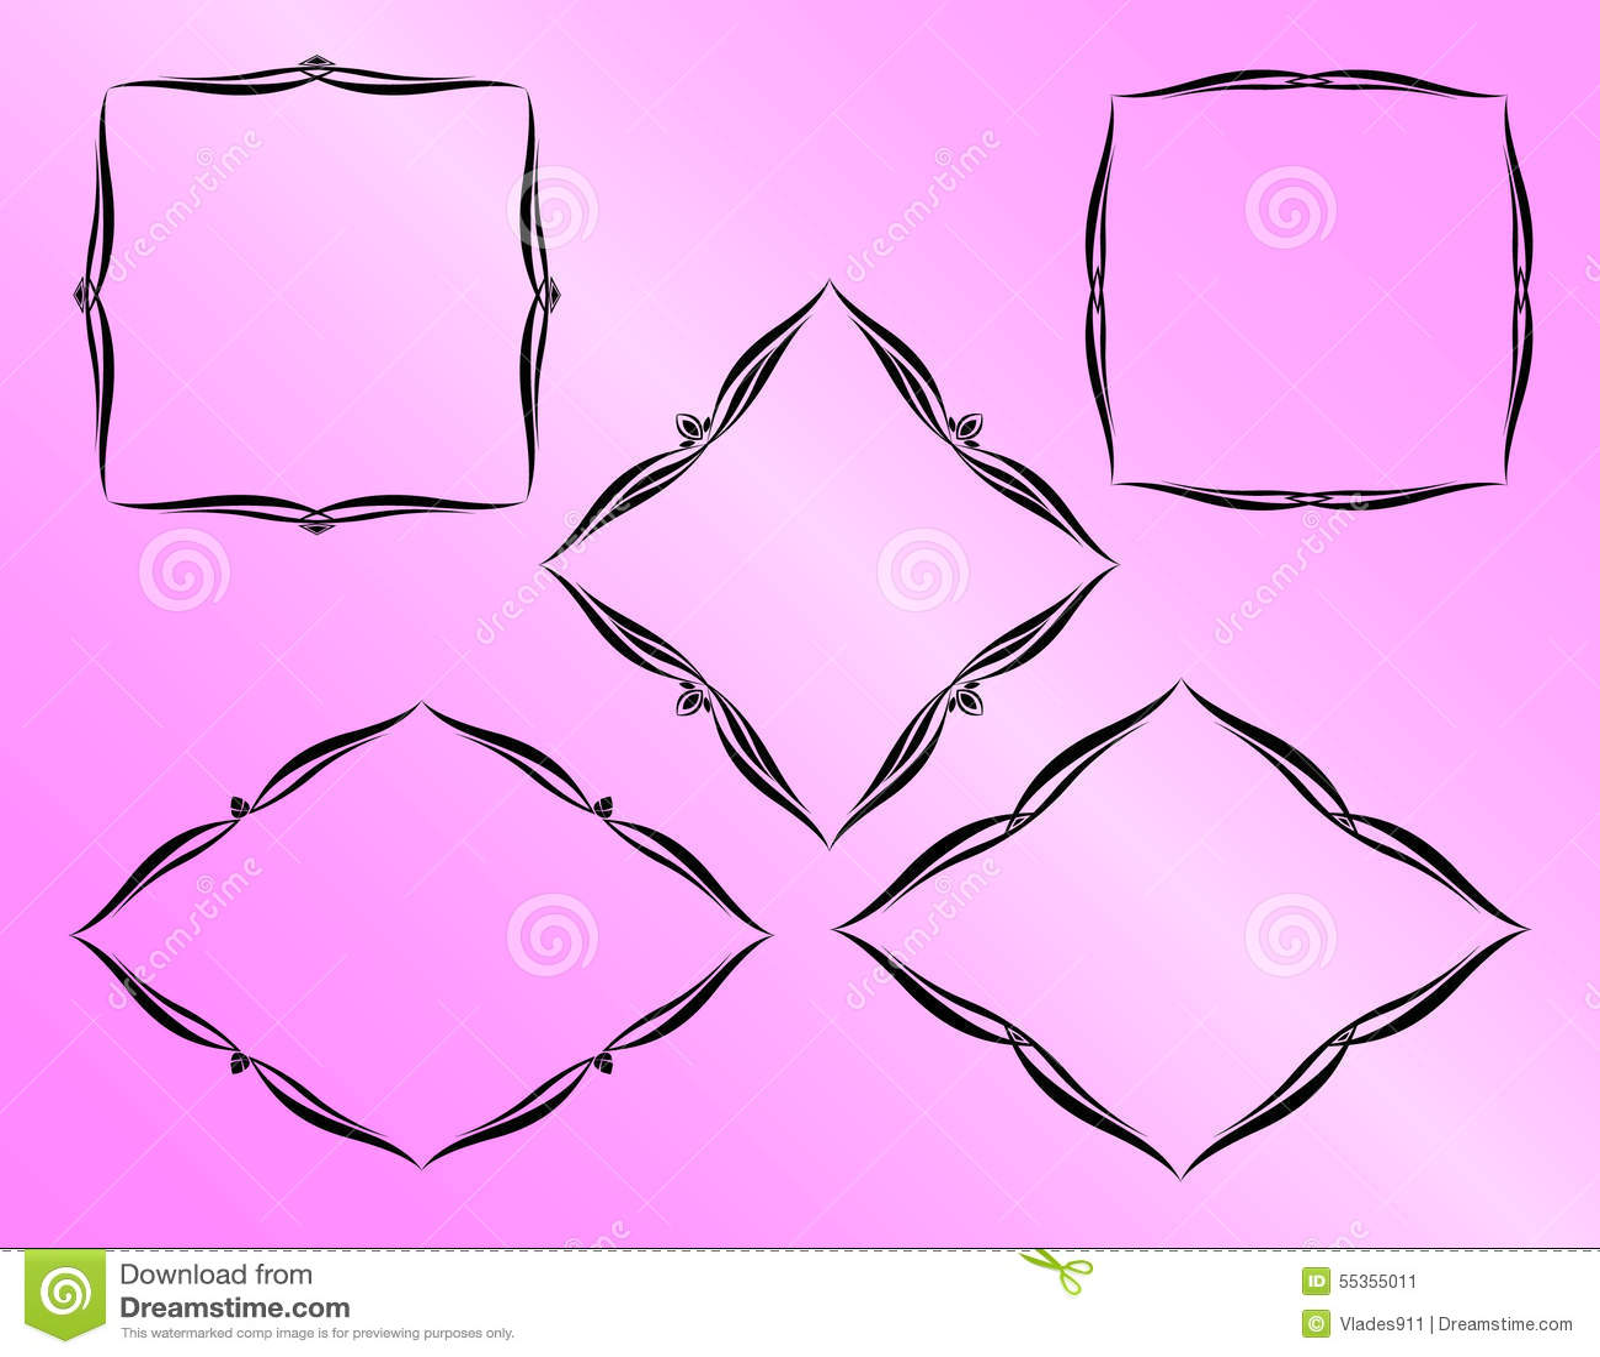 Vector i blocchi per grafici decorativi